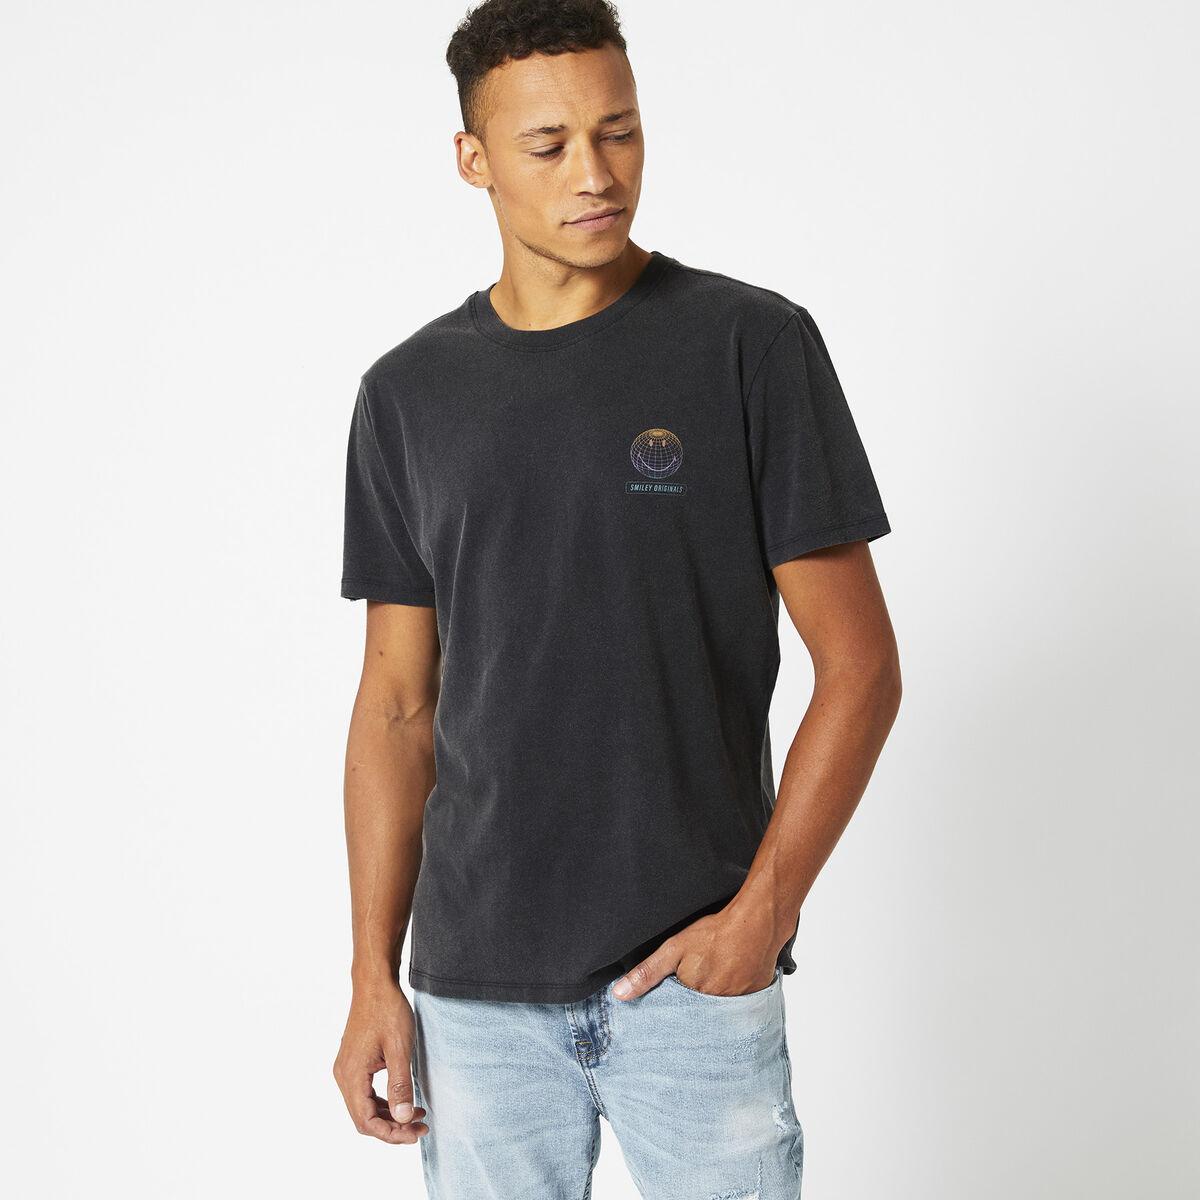 T-shirt Echo virtual